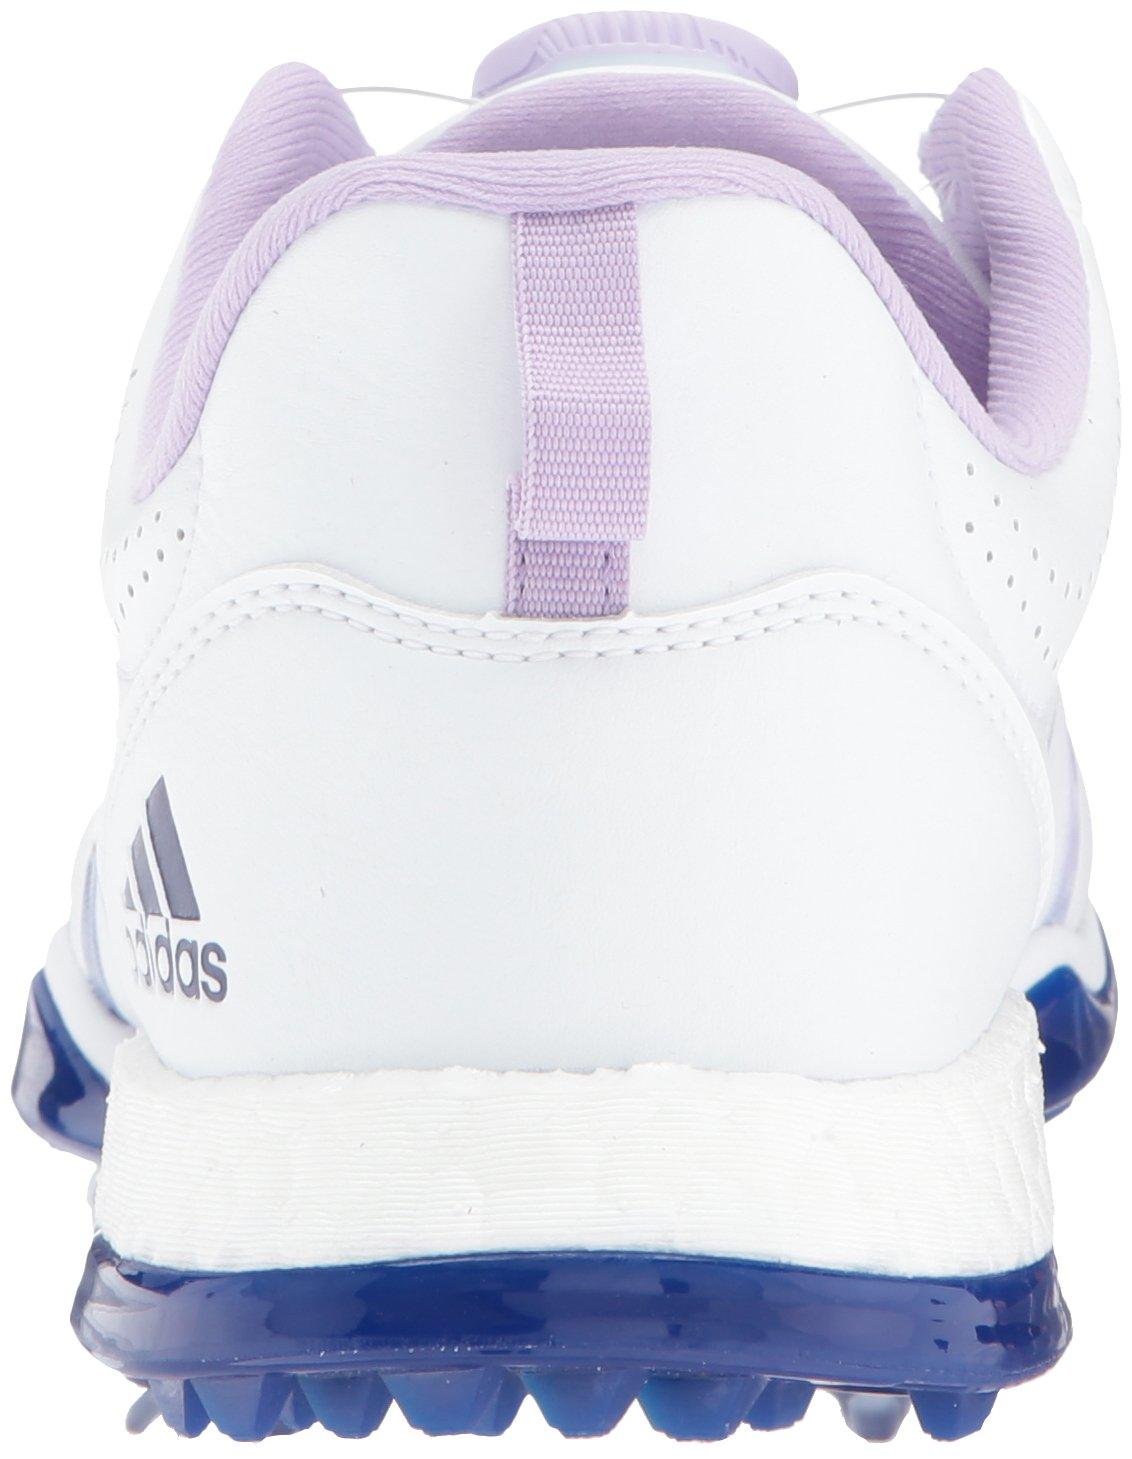 adidas Women's W Adipower Boost Boa B(M) Golf Shoe B01N30AUVD 7.5 B(M) Boa US|White/Purple Glow/Mystery Ink 935b82